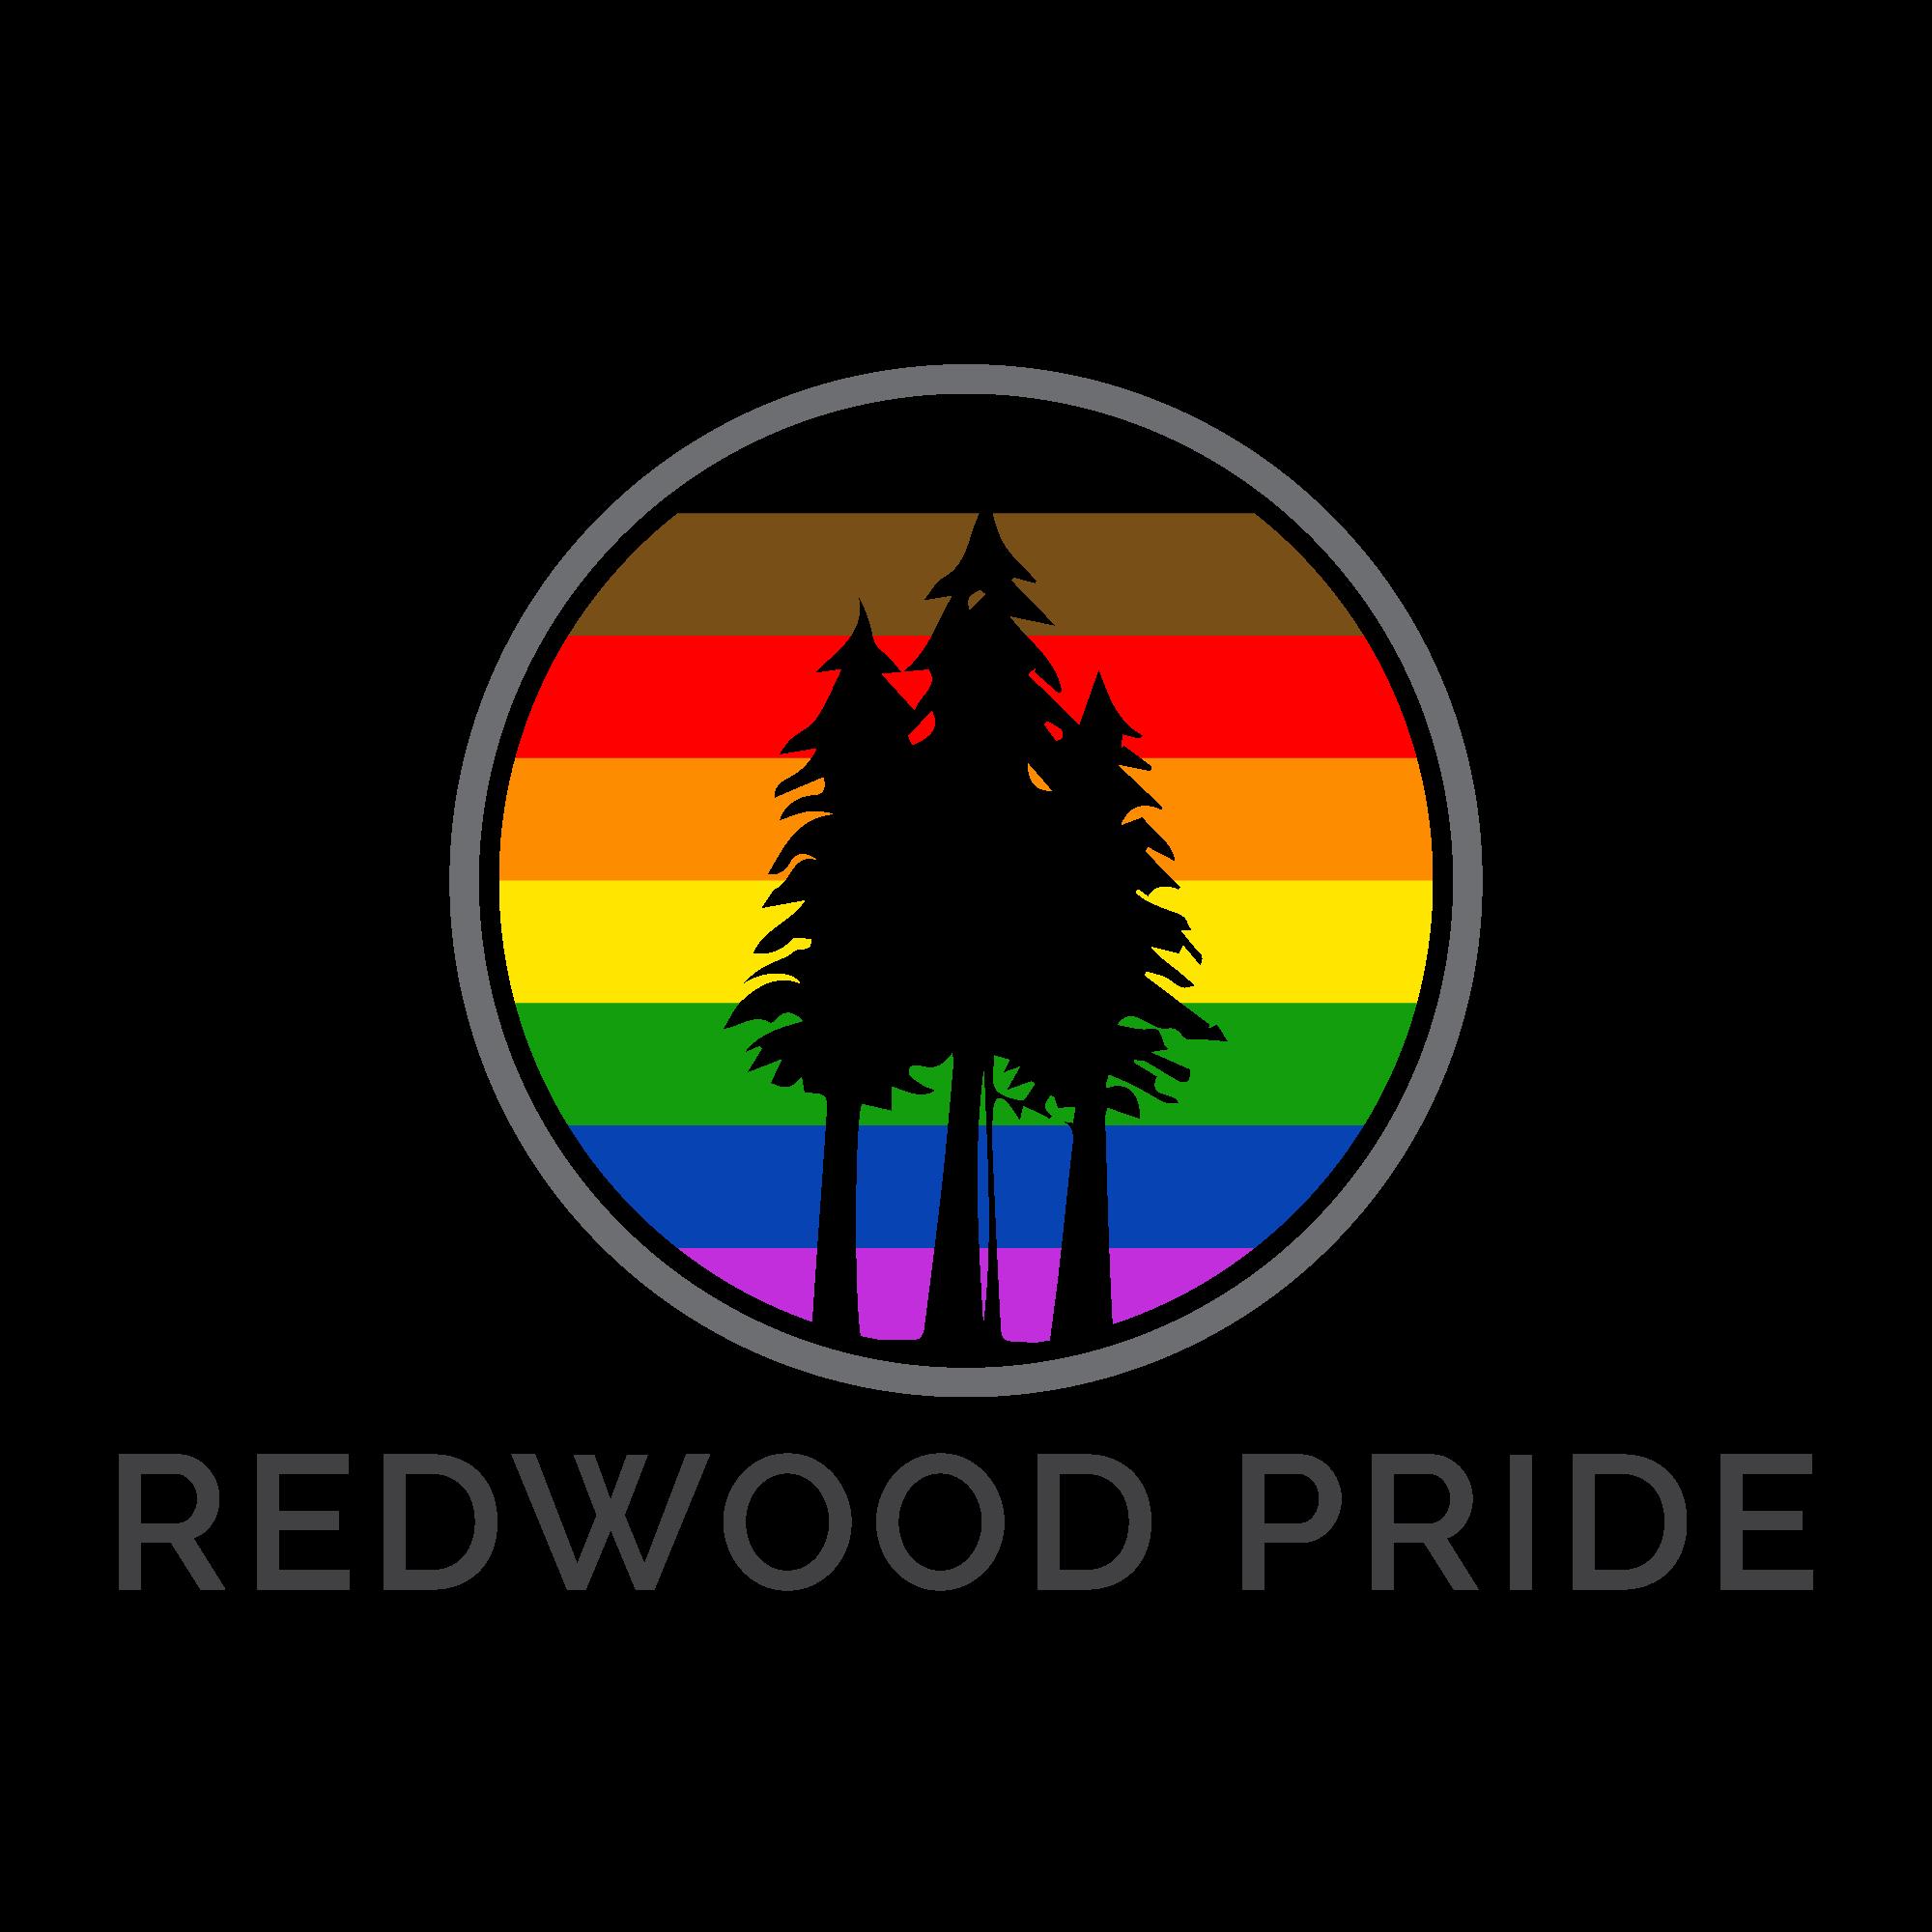 Redwood-Pride-LOGO-A2.png